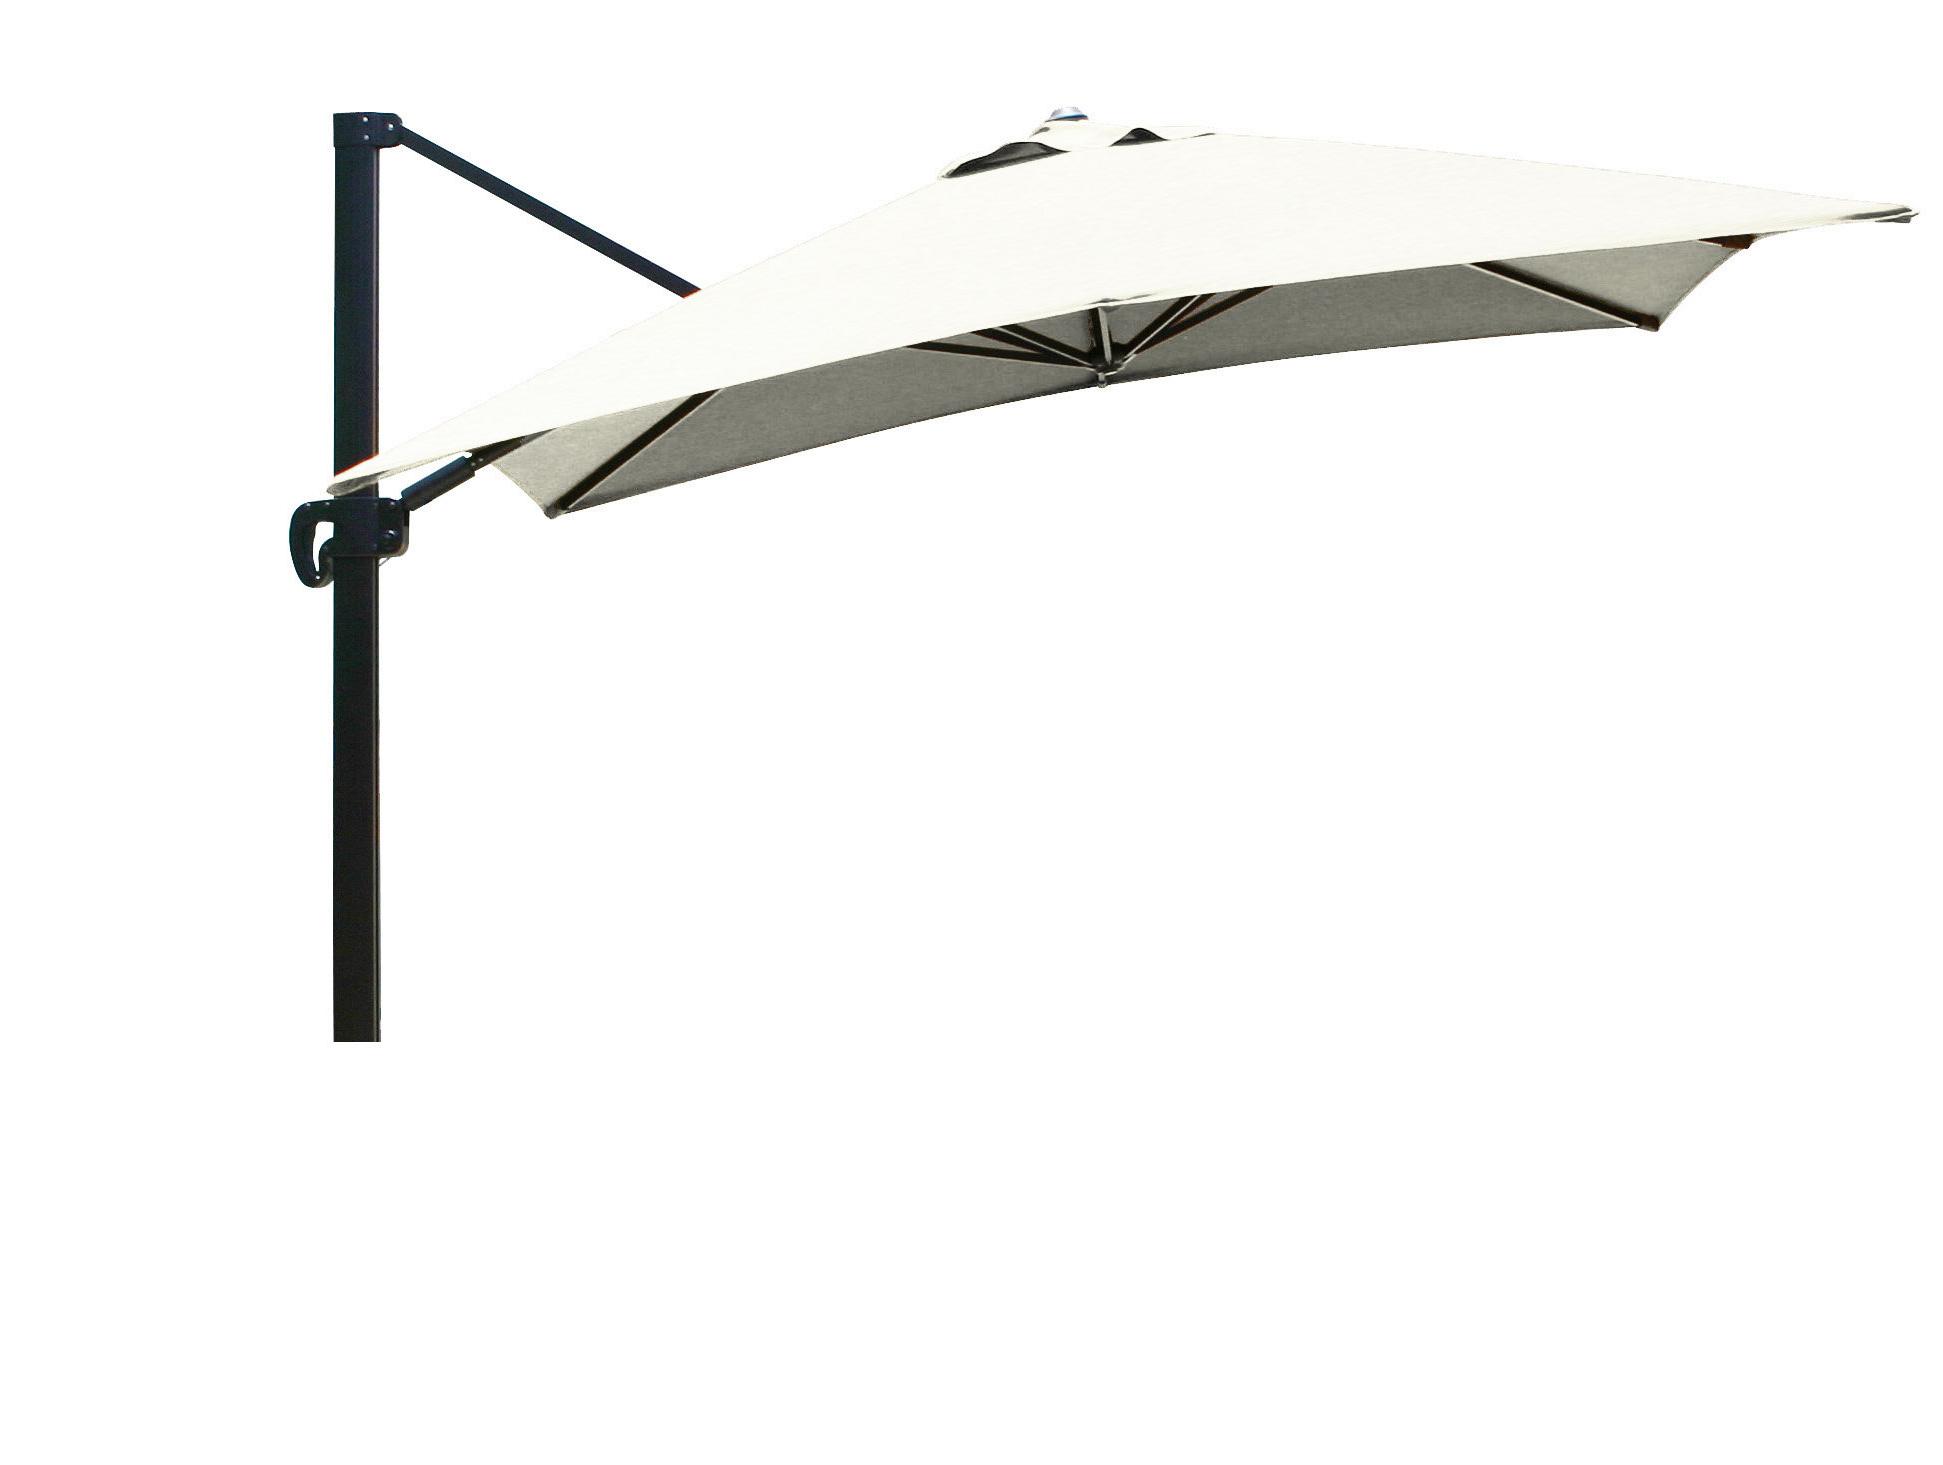 Carlisle Square Cantilever Sunbrella Umbrellas Intended For 2020 Carlisle 10' Square Cantilever Sunbrella Umbrella (View 8 of 20)